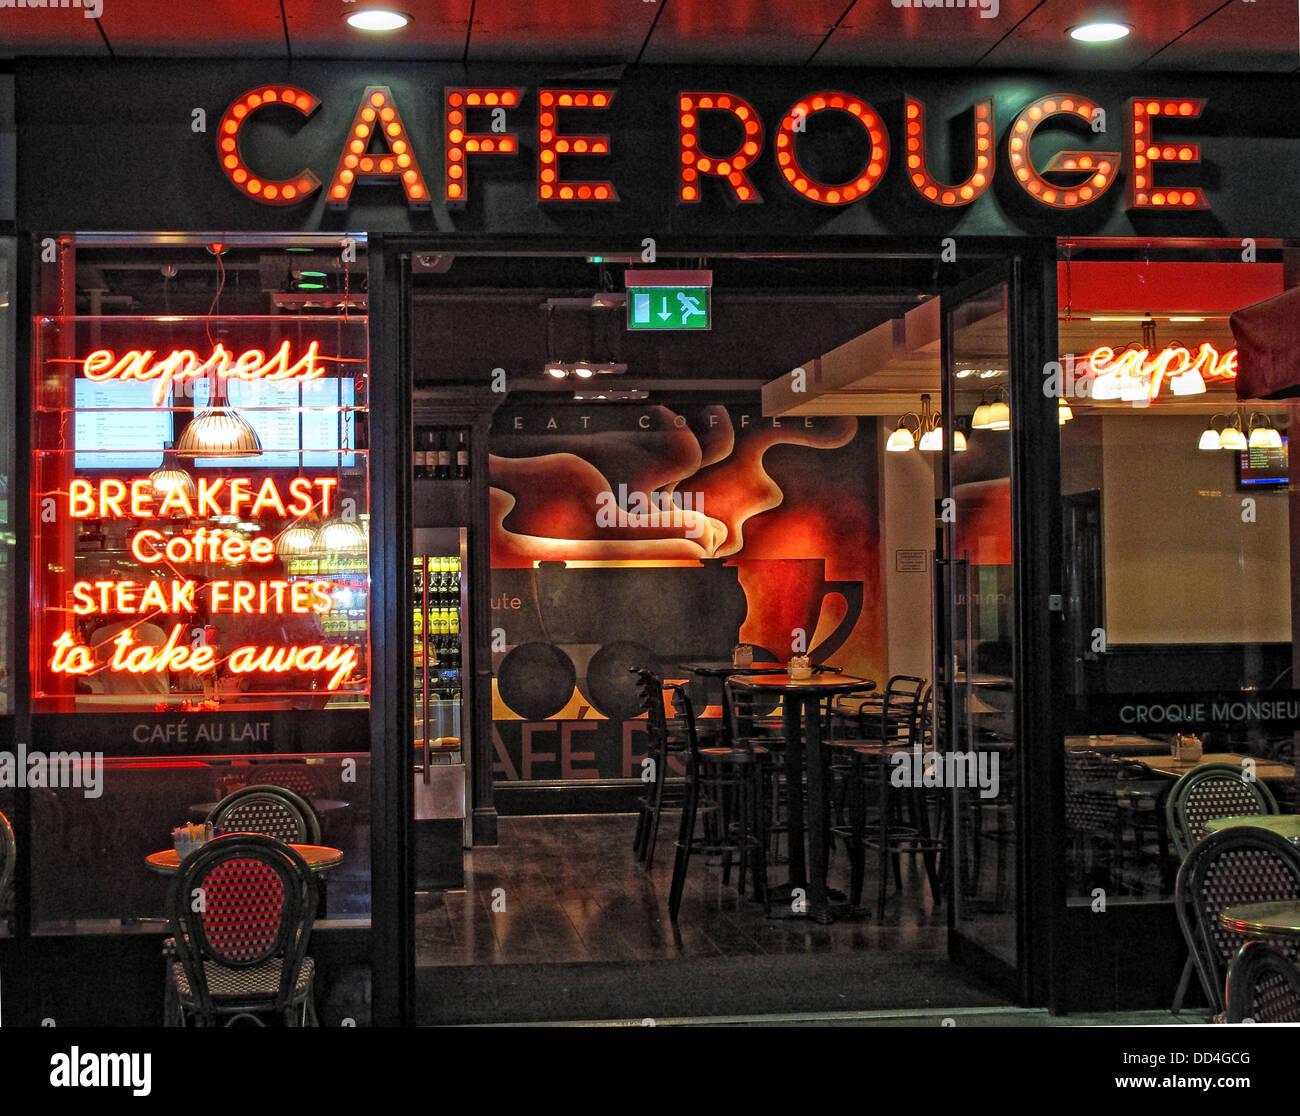 GoTonySmith,@HotpixUK,Tony,Smith,UK,GB,Great,Britain,United,Kingdom,English,British,England,problem,with,problem with,issue with,Buy Pictures of,Buy Images Of,Images of,Stock Images,Tony Smith,United Kingdom,Great Britain,British Isles,French-styled restaurant,eating,eatery,Euston railway station,fast service,reduced menu range,Café Rouge Express,Café Rouge,sign,Cafe Rouge Sign,high st,High Street,restaurants,restaurant,CafeRouge